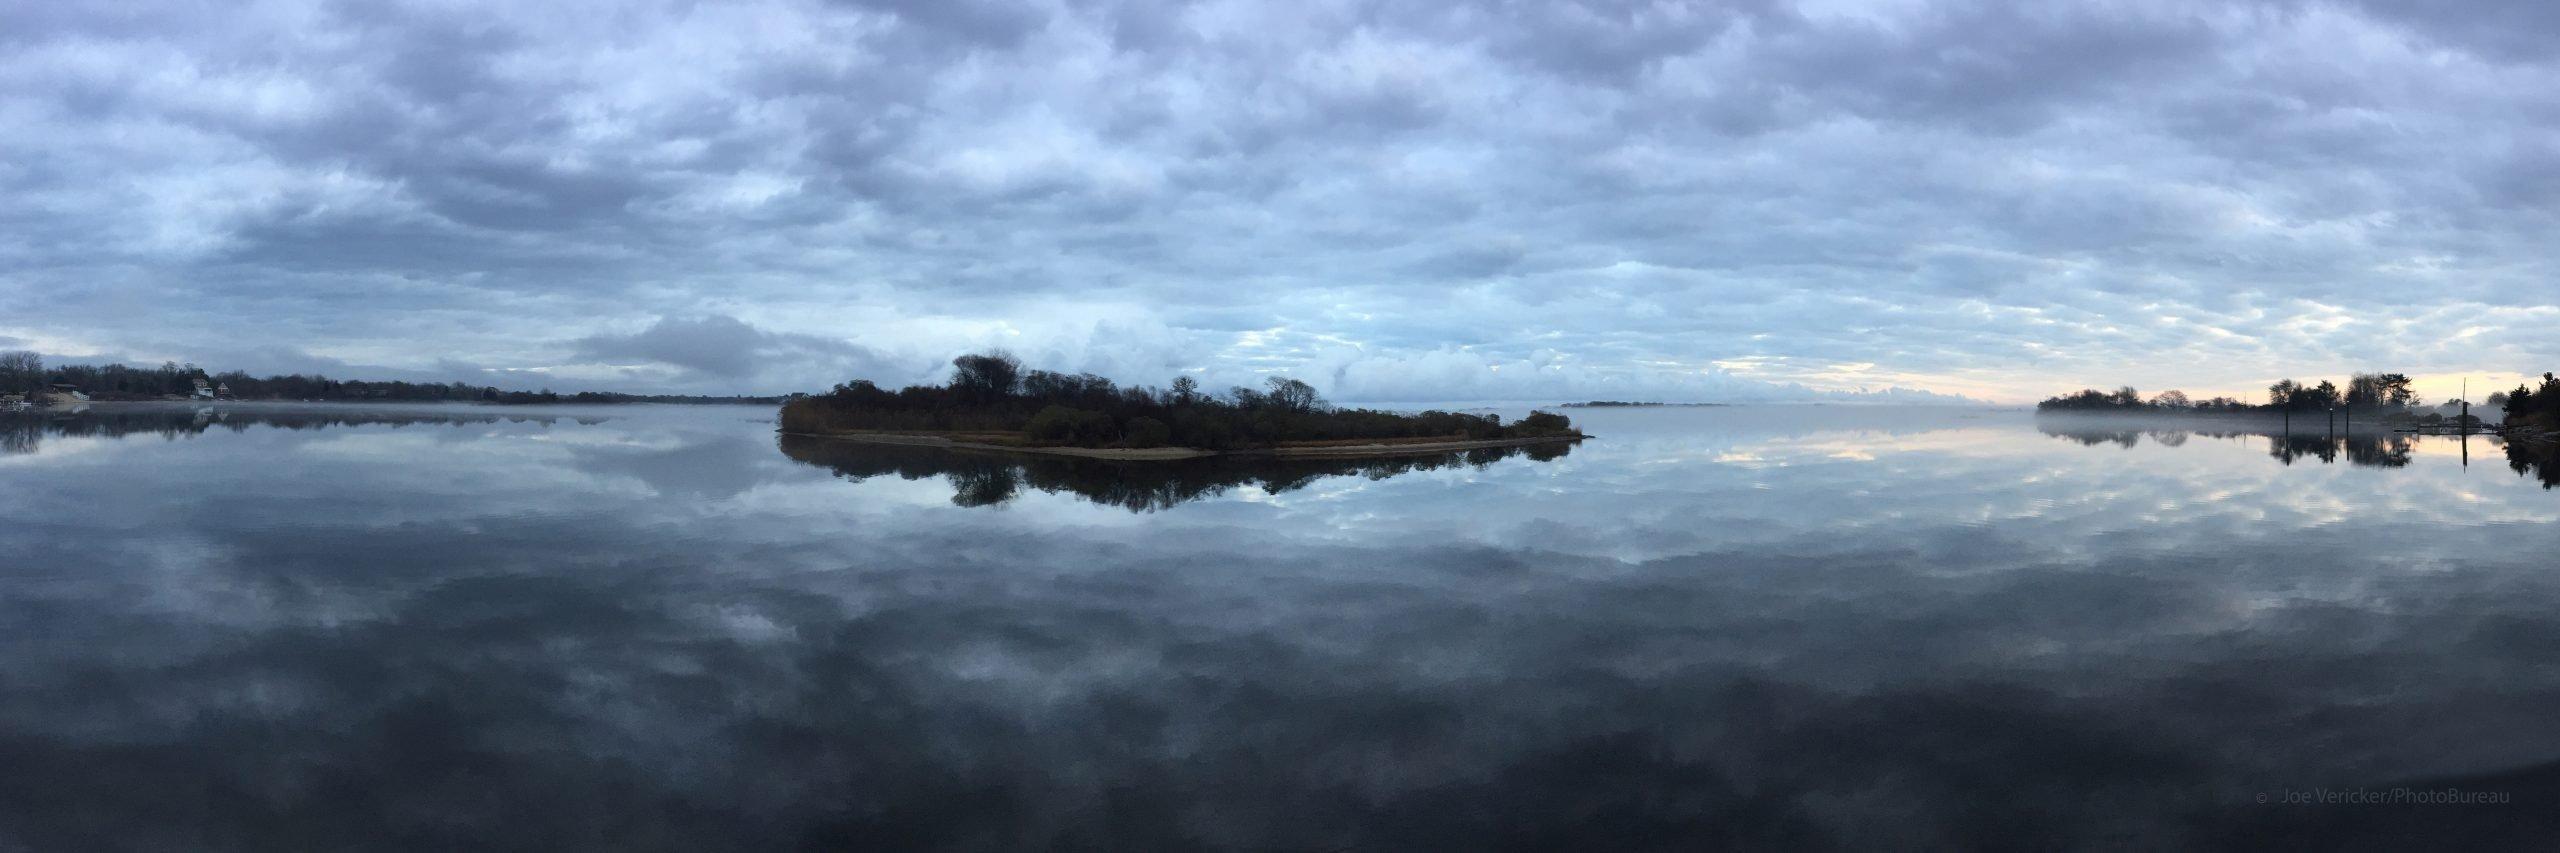 Joe Vericker. Ram Island. All rights reserved.